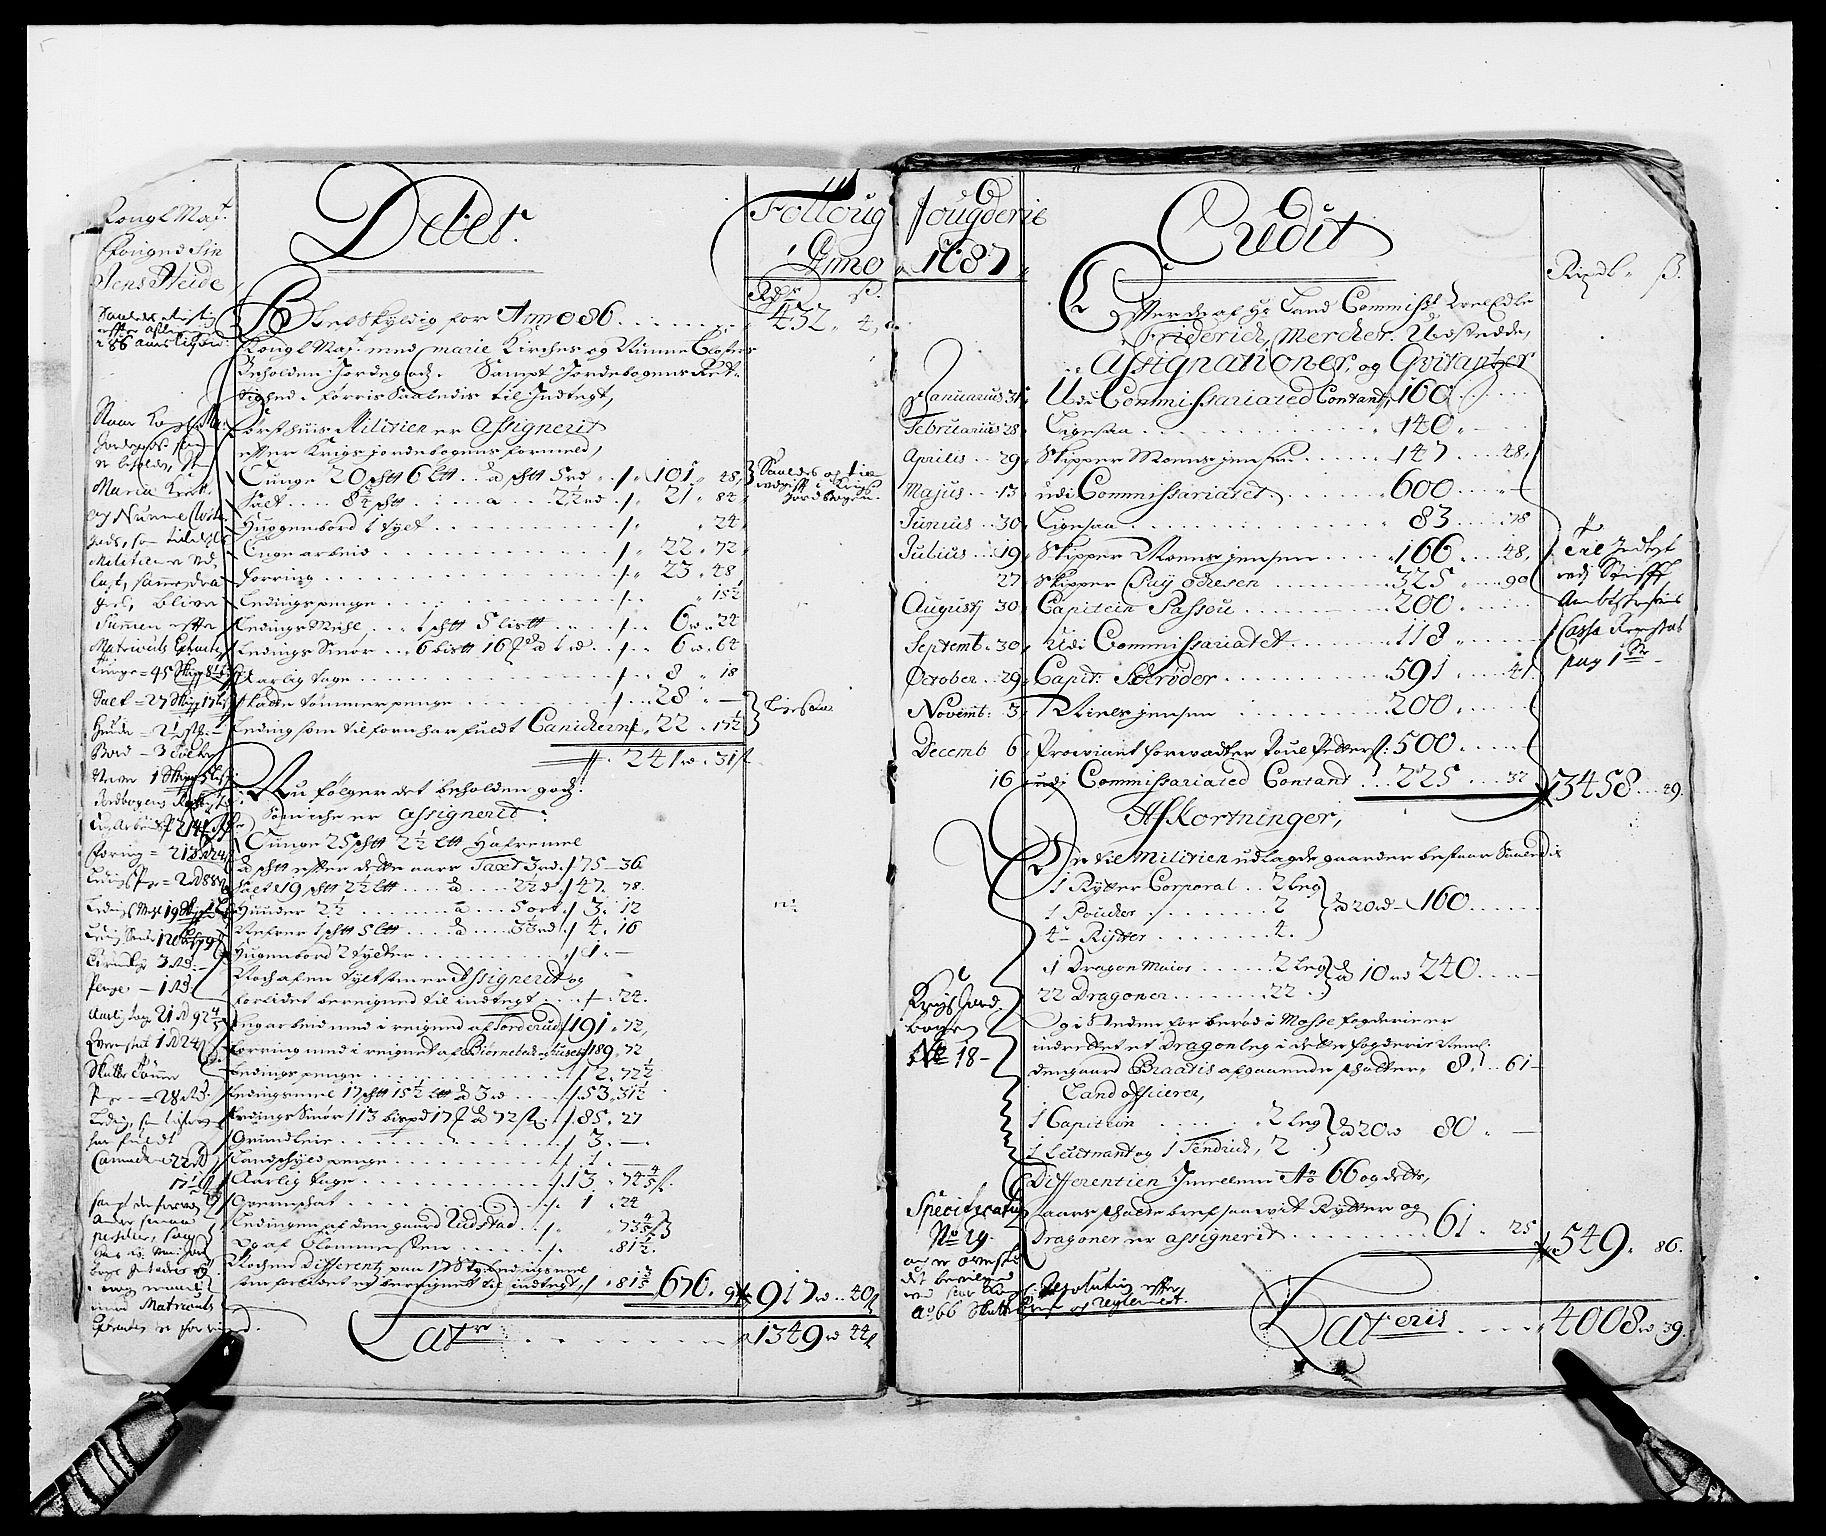 RA, Rentekammeret inntil 1814, Reviderte regnskaper, Fogderegnskap, R09/L0436: Fogderegnskap Follo, 1685-1691, s. 12